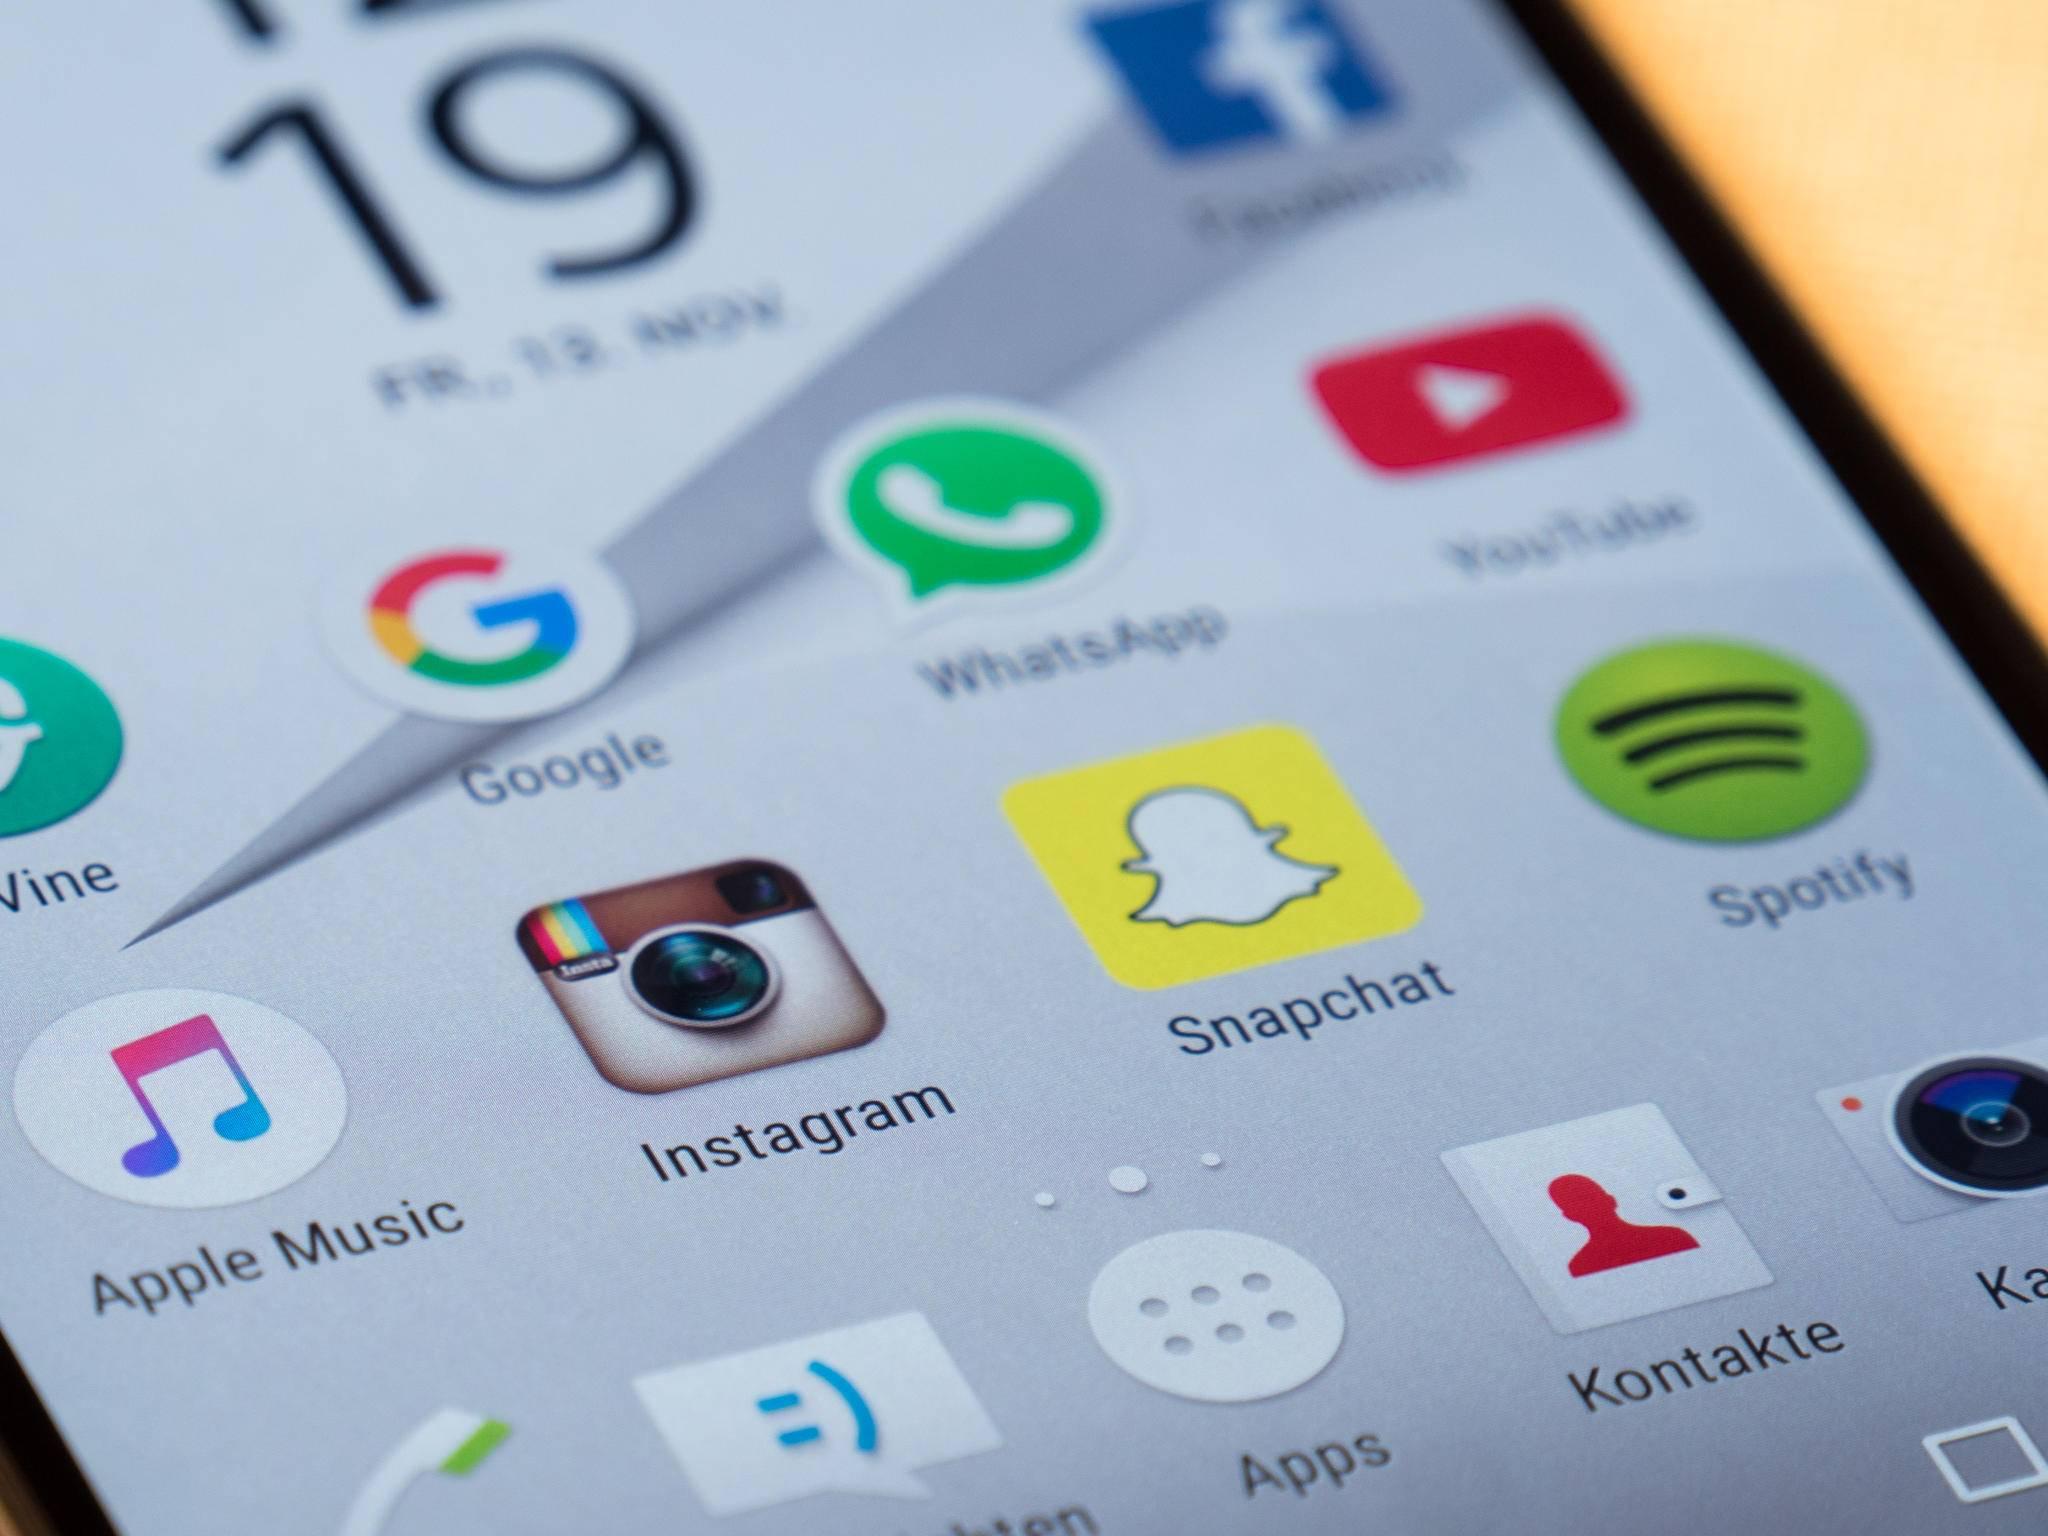 Instagram, Snapchat, Apps